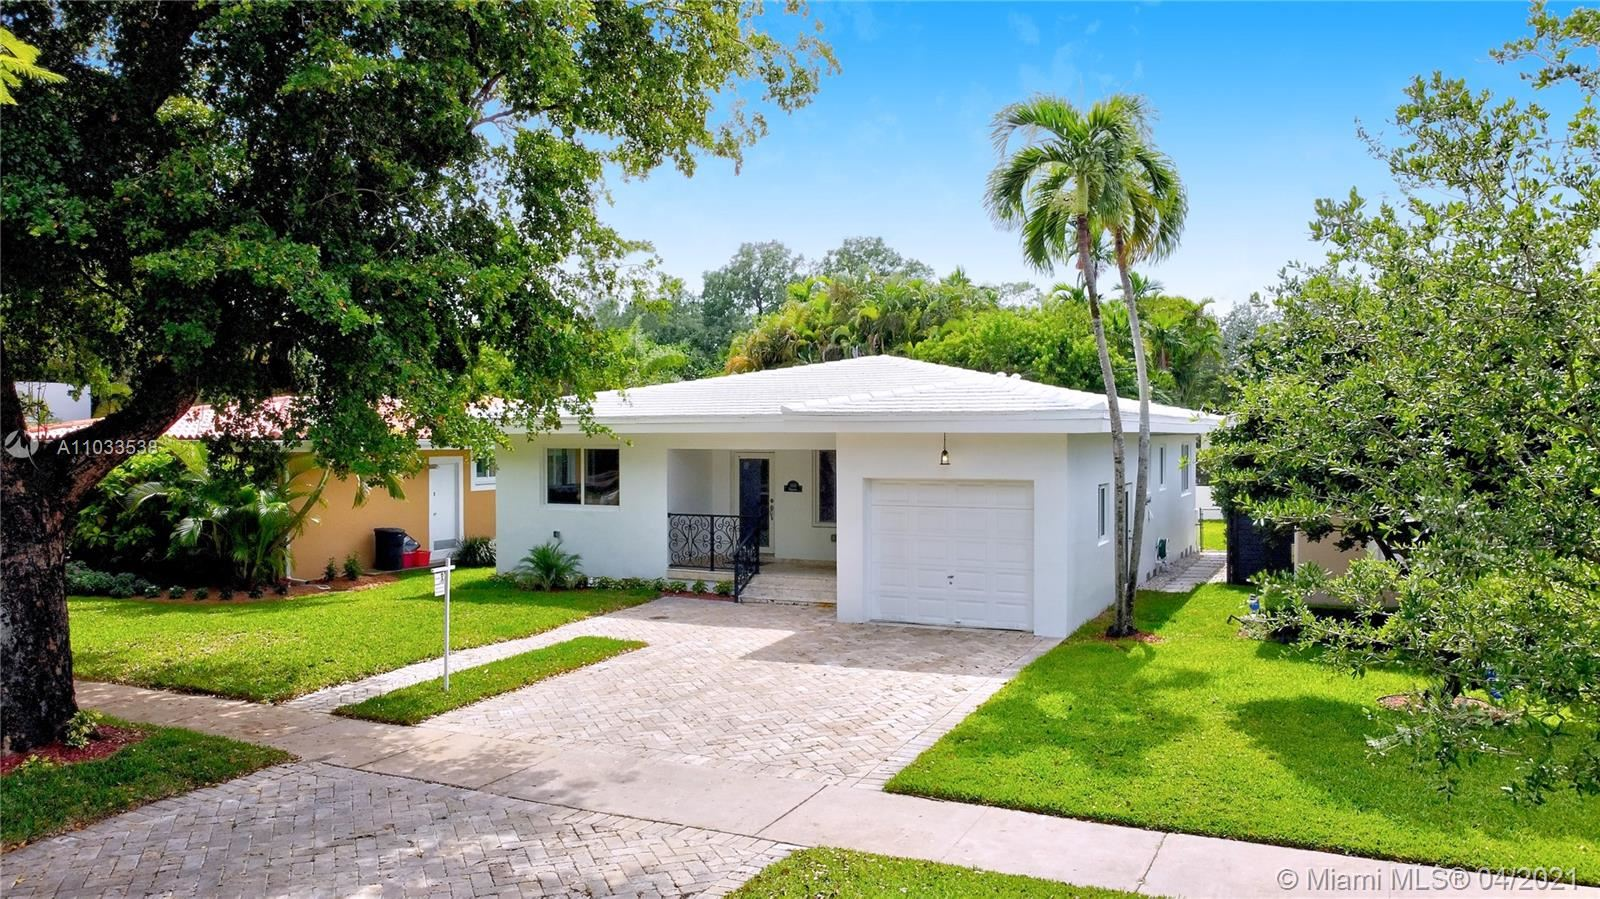 1410 Ferdinand St., Coral Gables, FL 33134 - #: A11033538